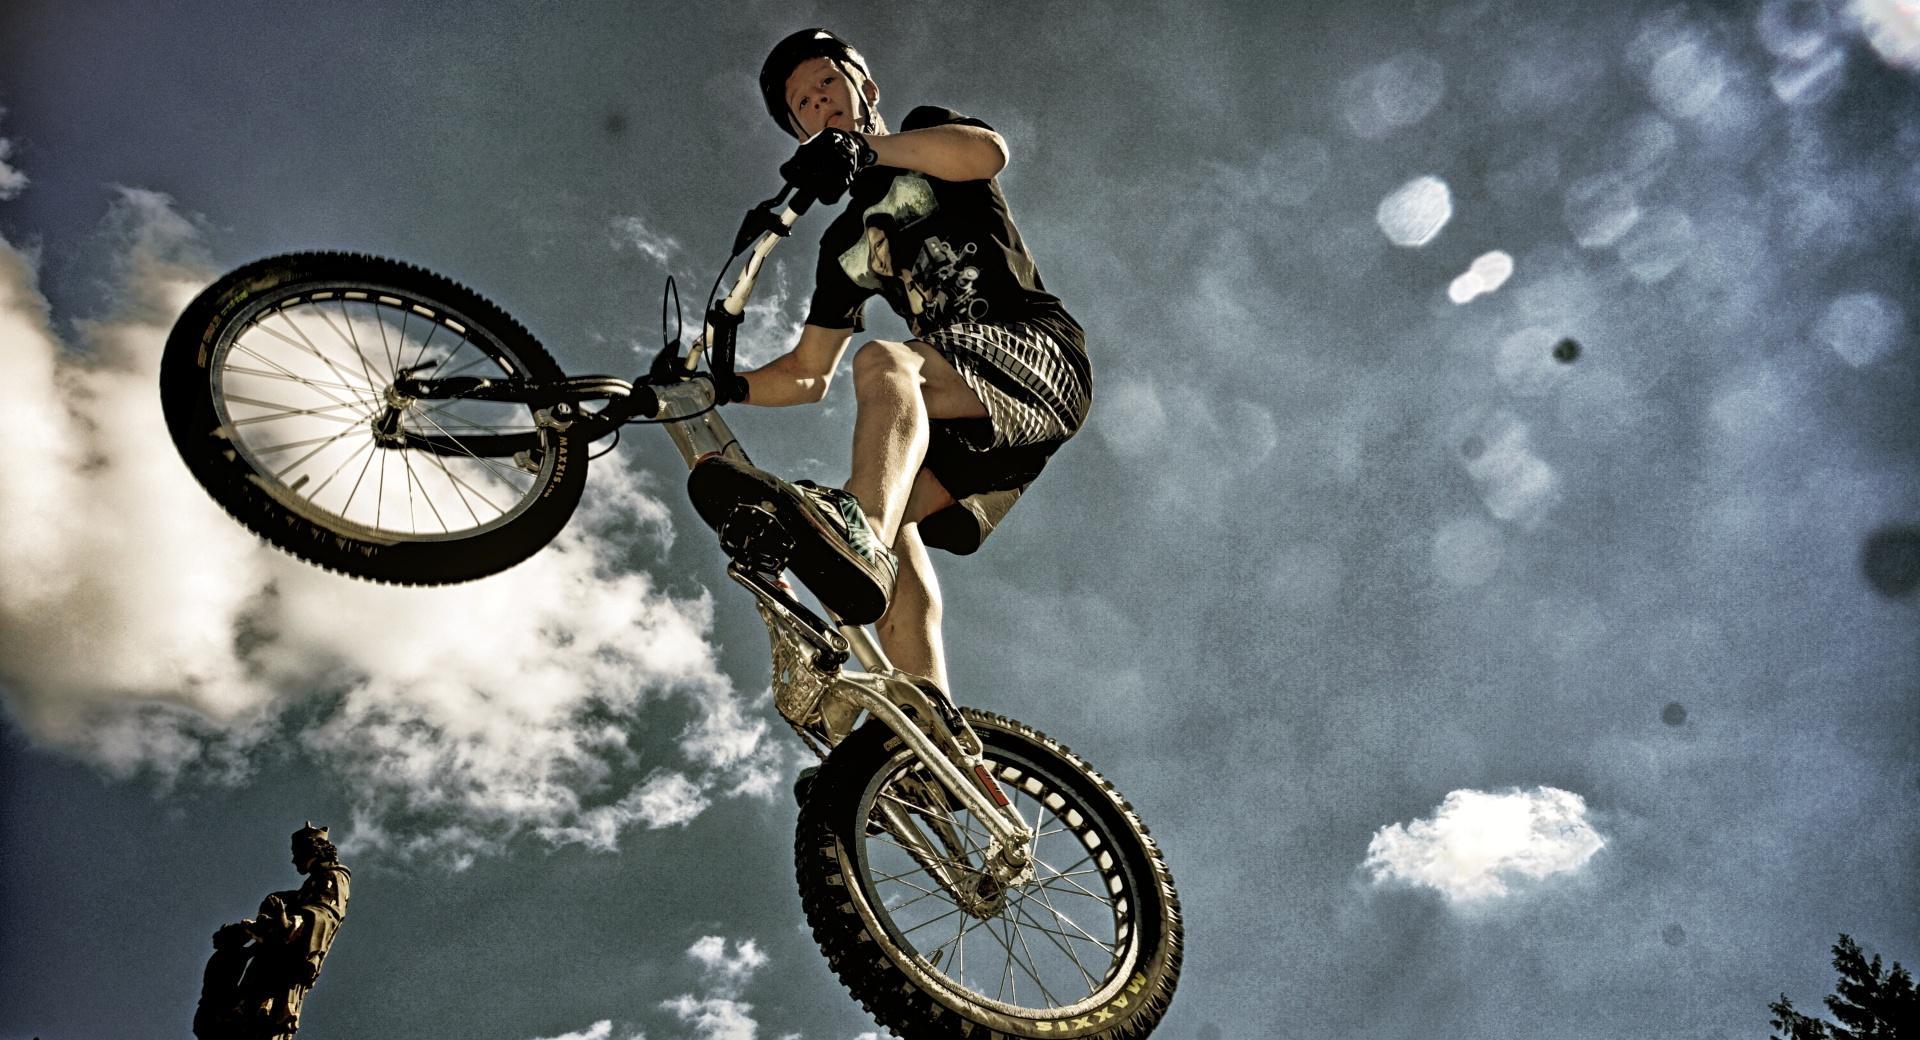 Bike Trial wallpapers HD quality